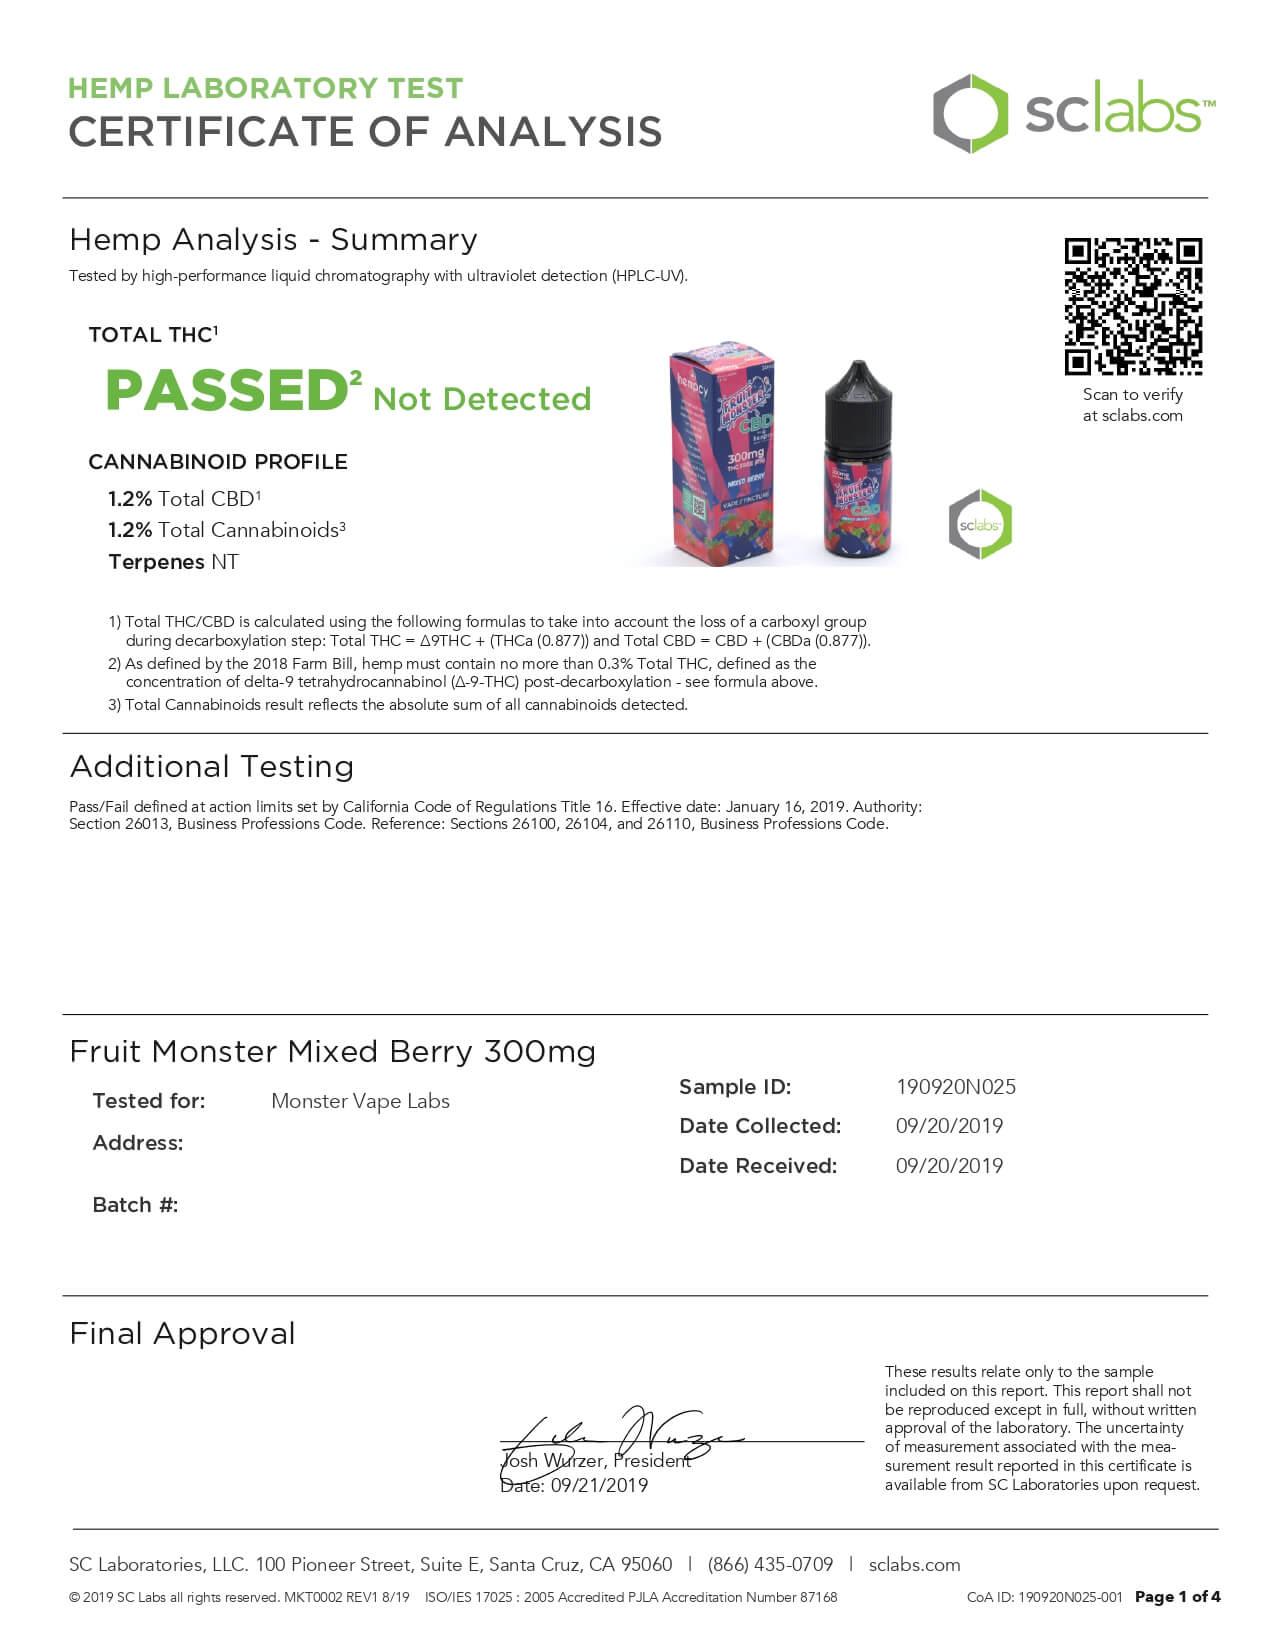 Fruit Monster CBD Vape Mixed Berry 300mg Lab Report